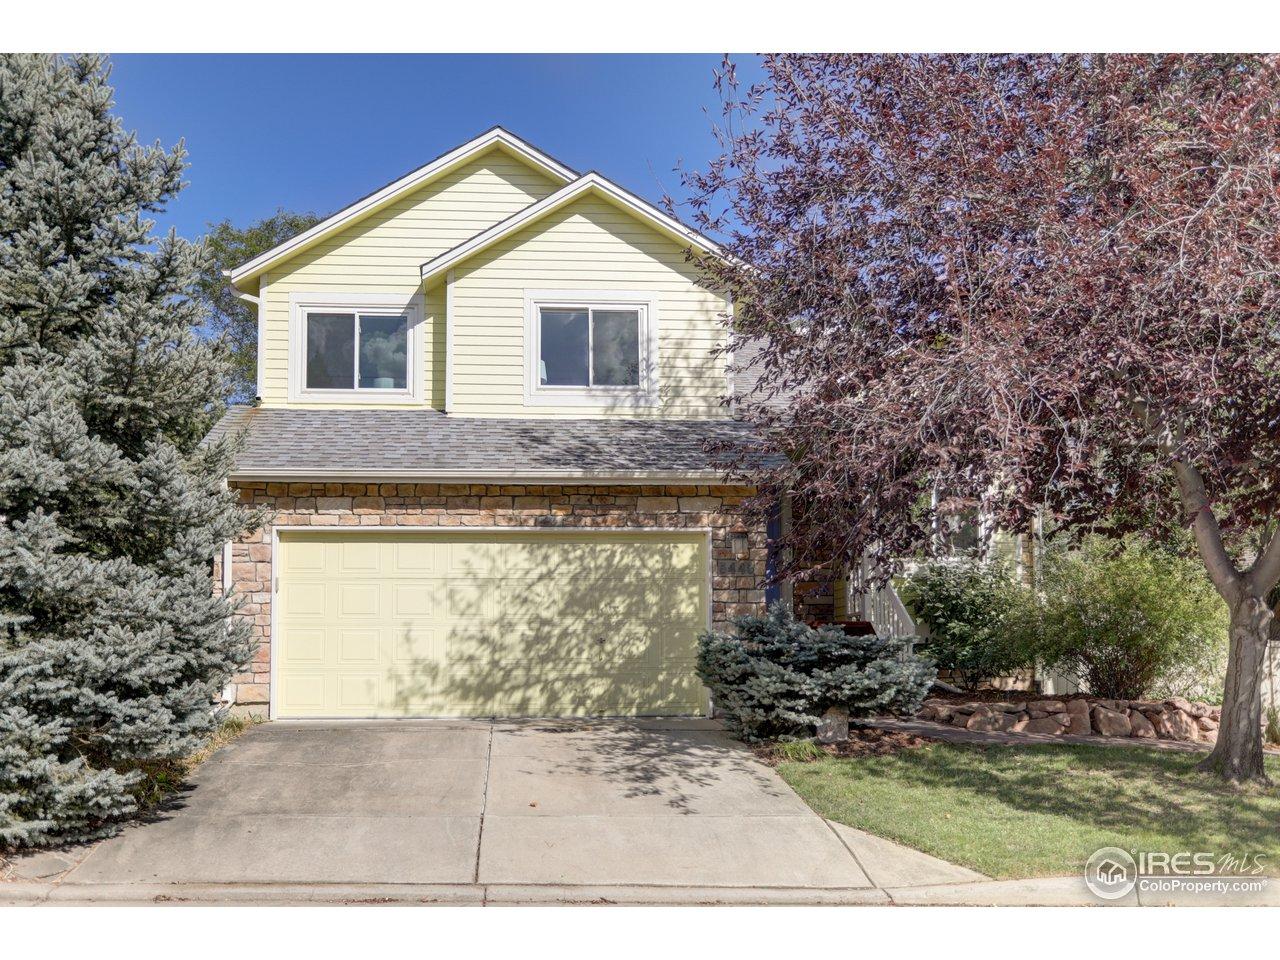 5440 Glendale Gulch Cir, Boulder CO 80301